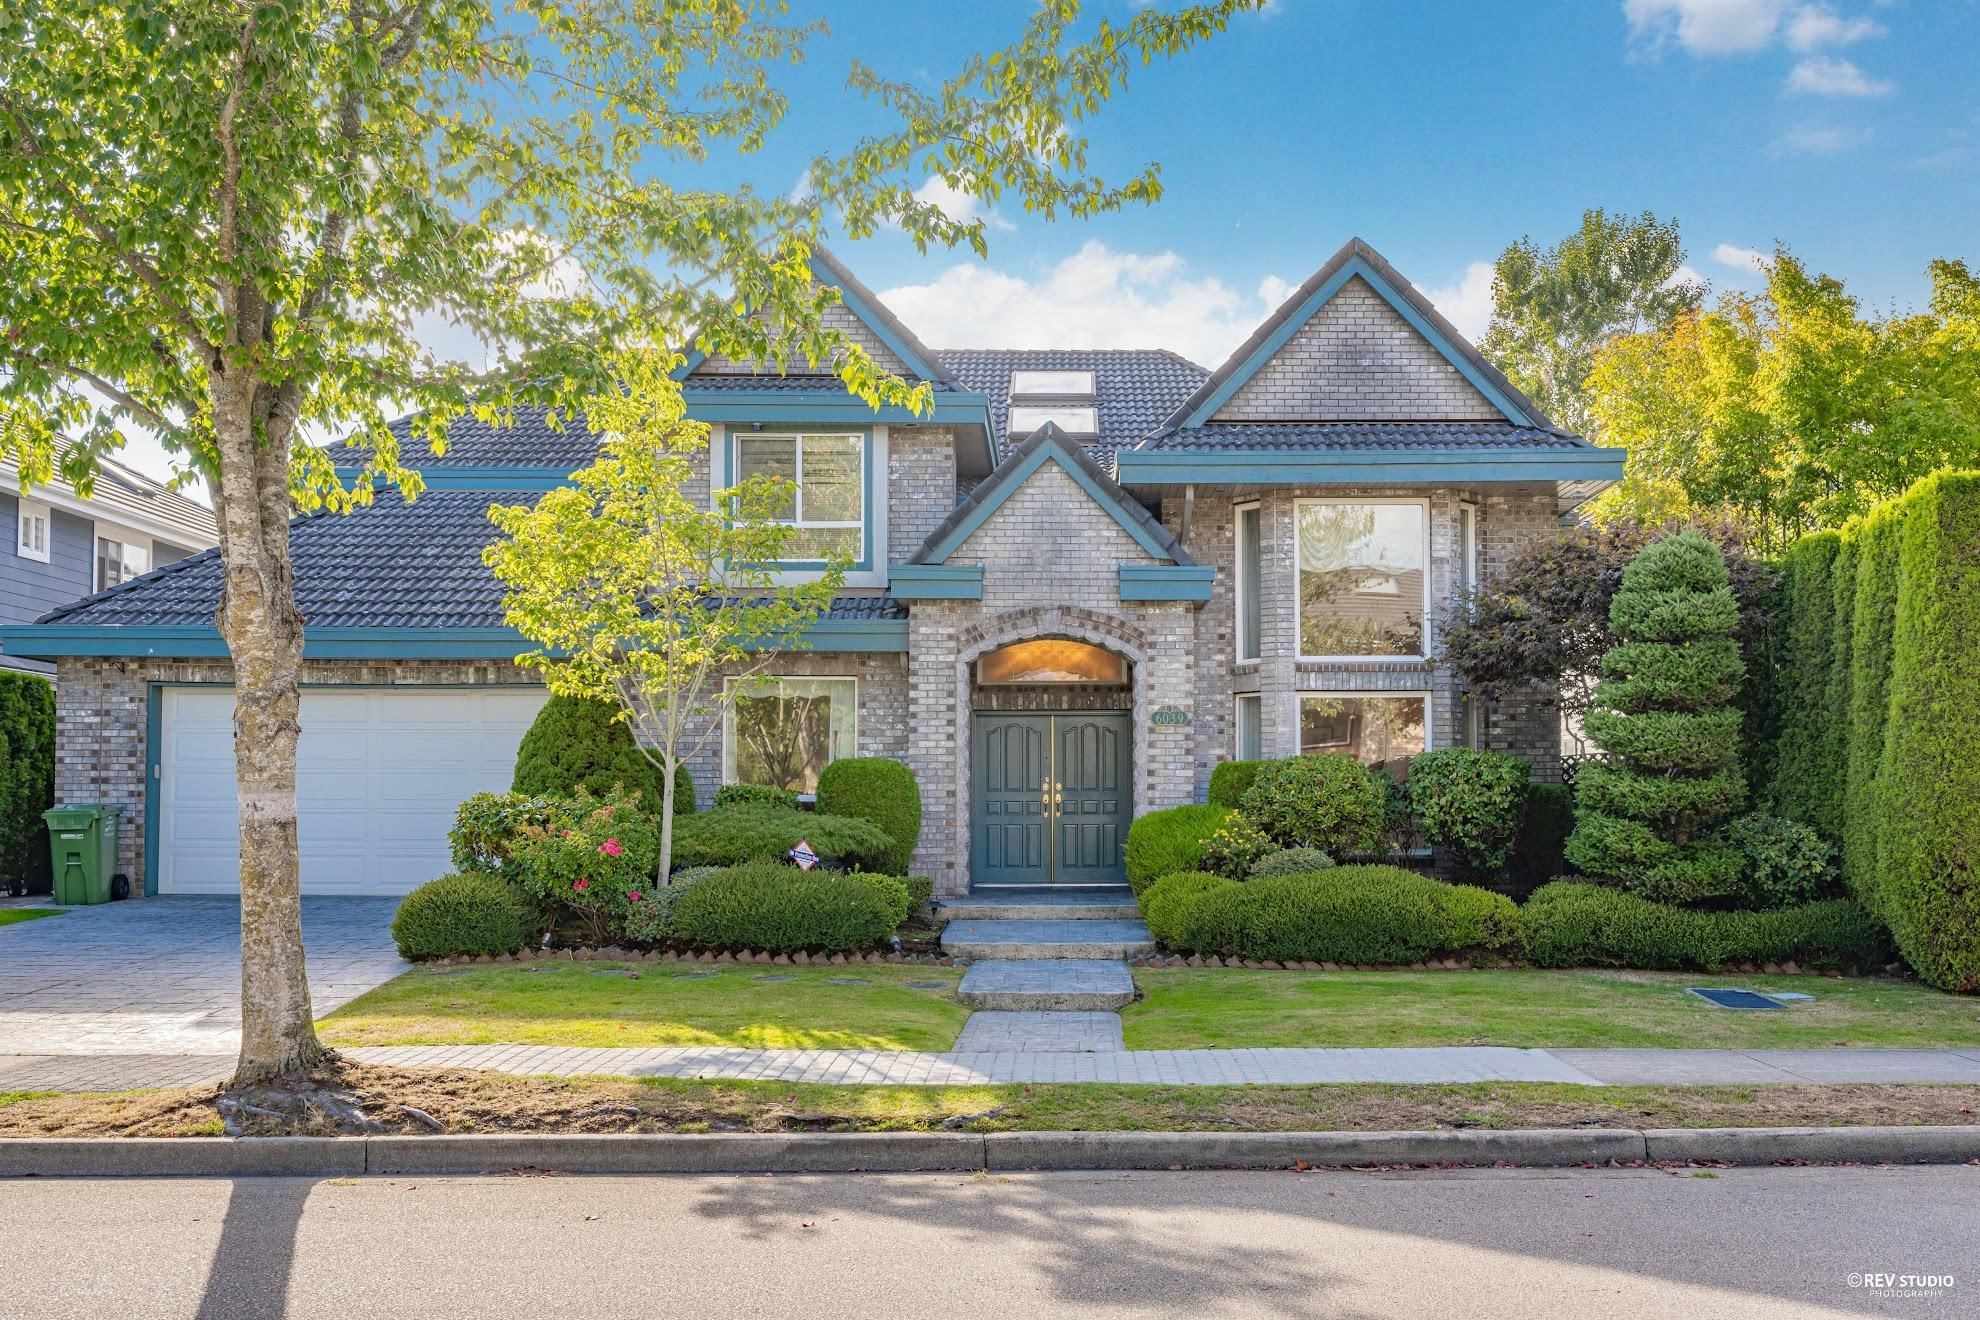 6039 PEARKES DRIVE - Terra Nova House/Single Family for sale, 6 Bedrooms (R2615112)